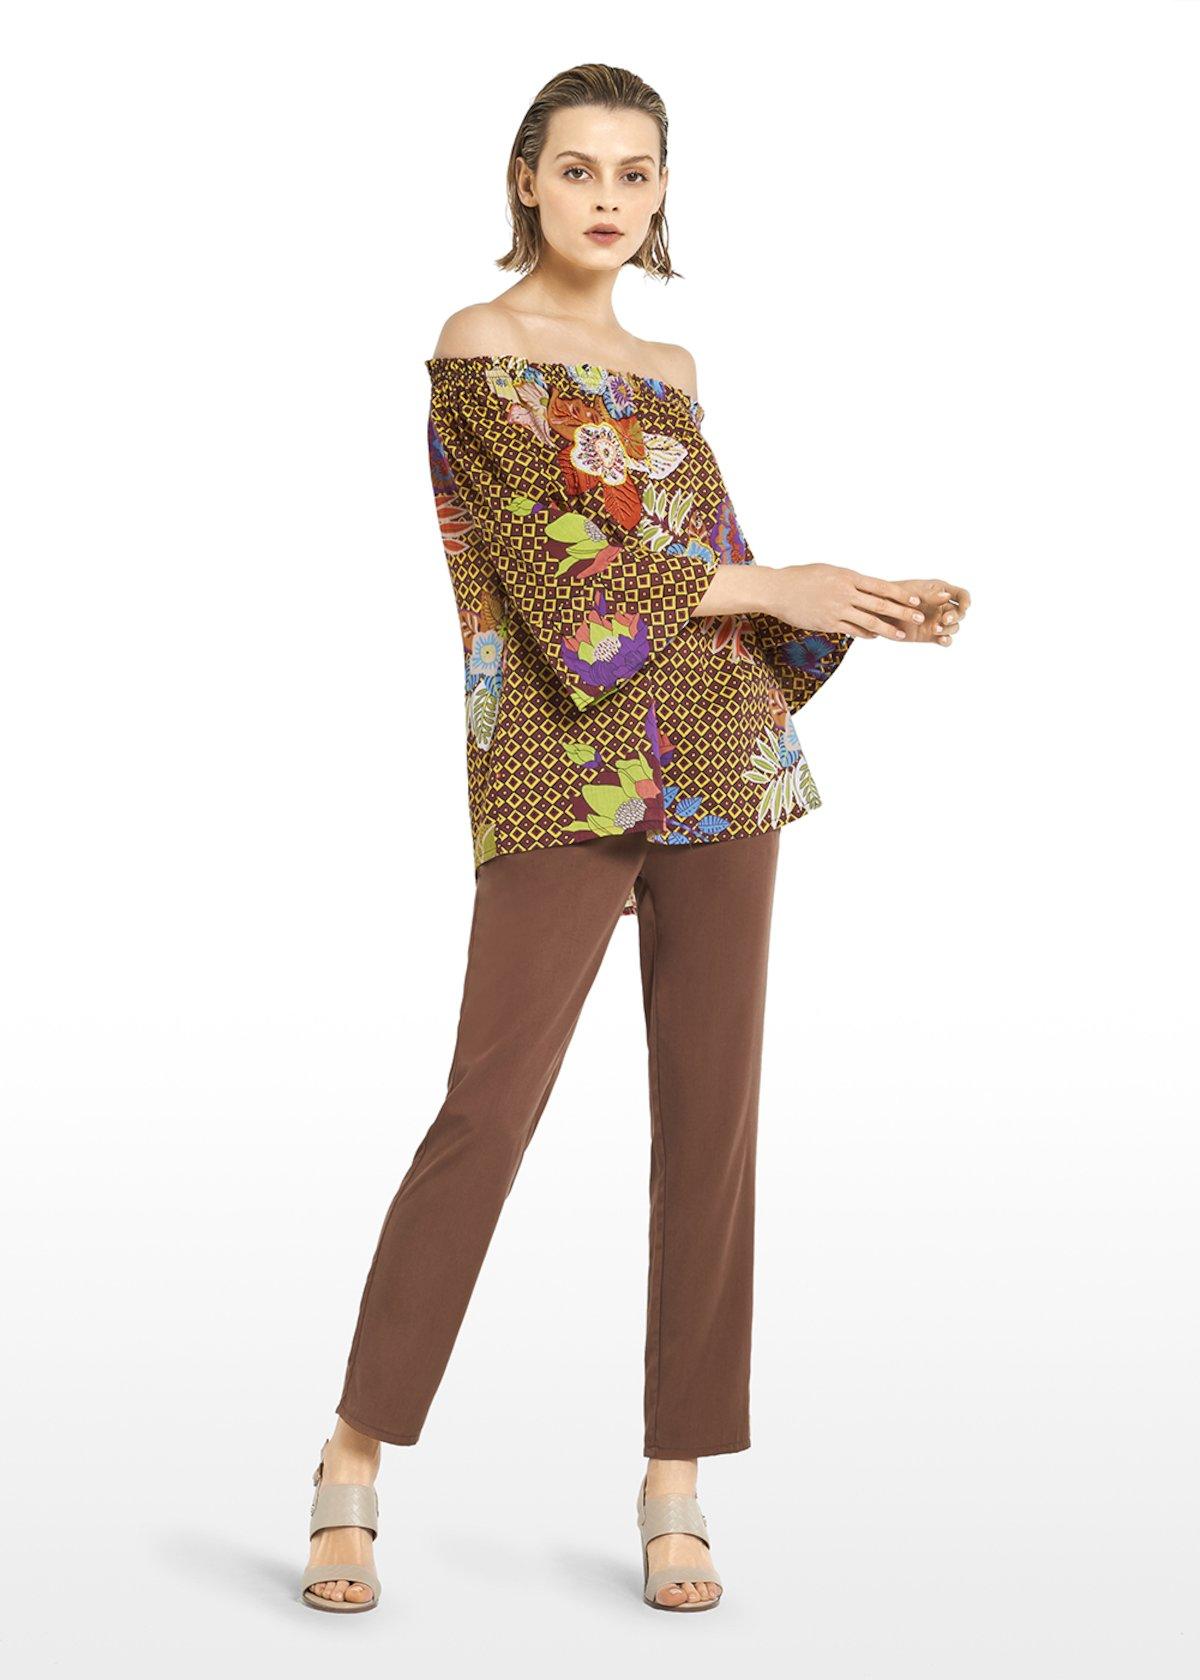 Blusa Charlie in cotone all-over-printed - Tobacco\ Ananas\ Fantasia - Donna - Immagine categoria